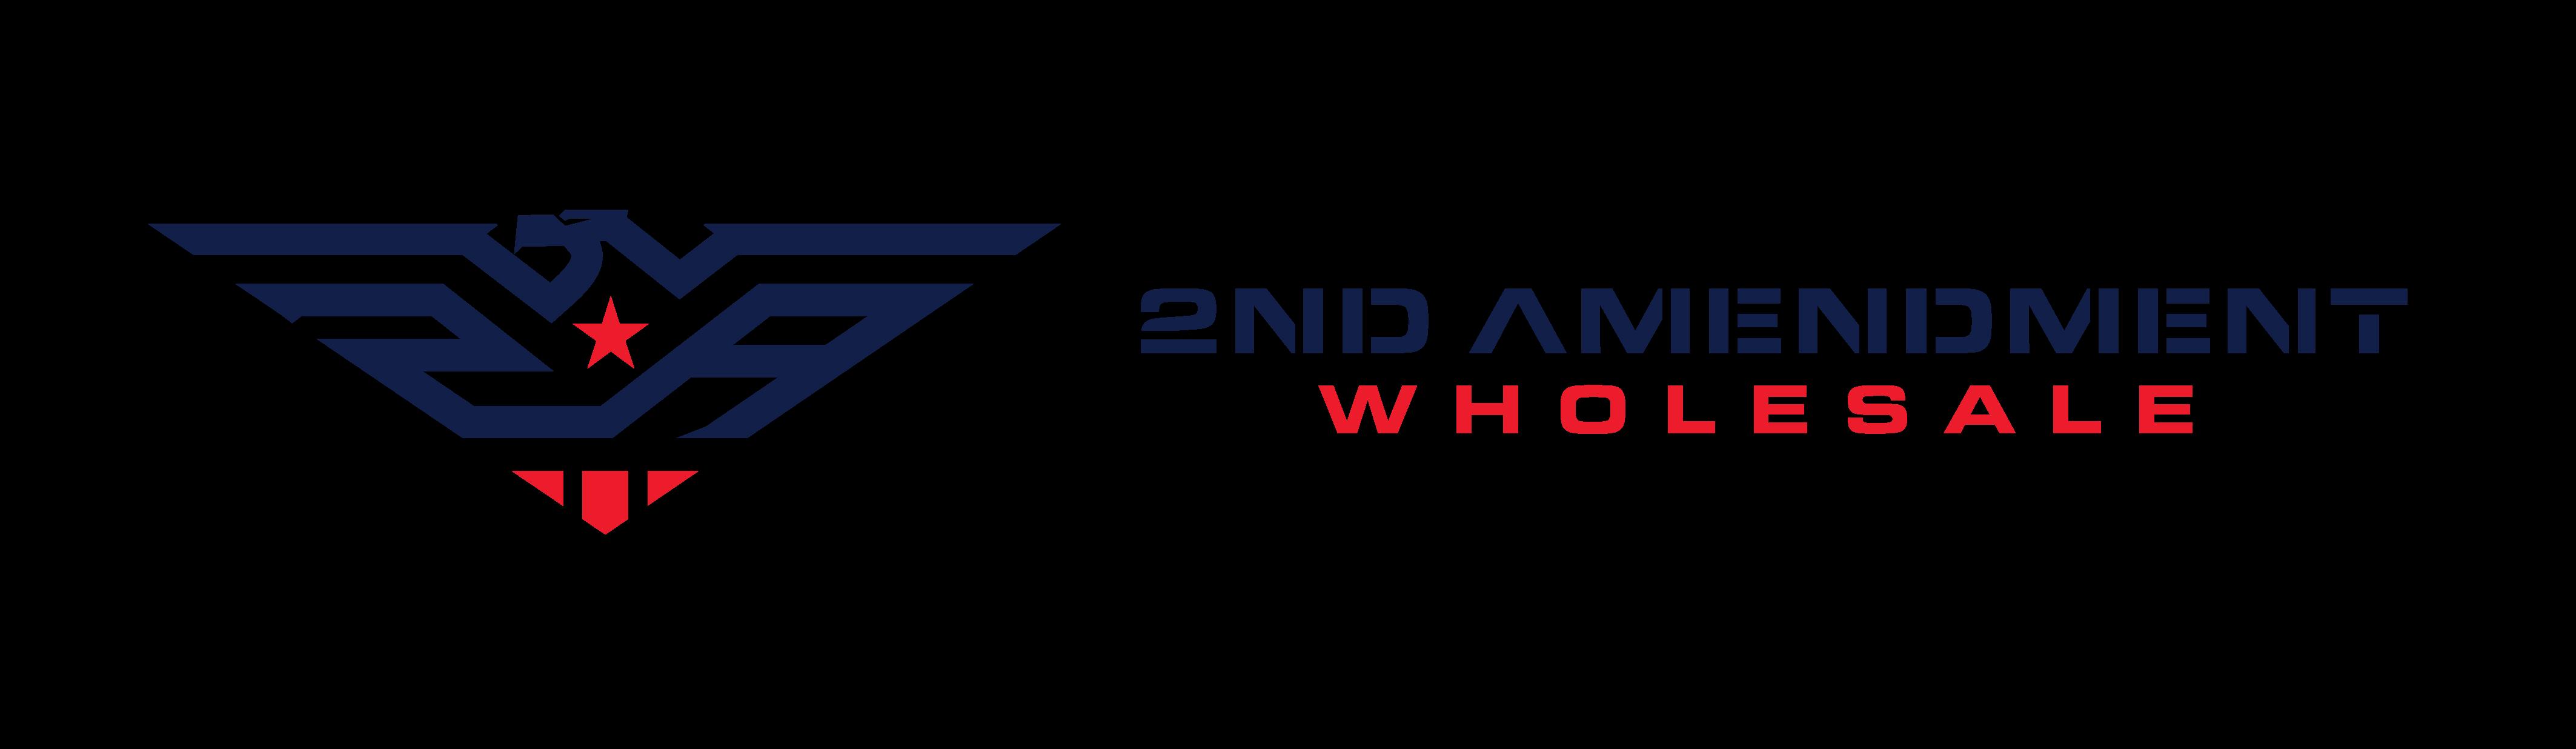 2nd Amendment Wholesale, Inc